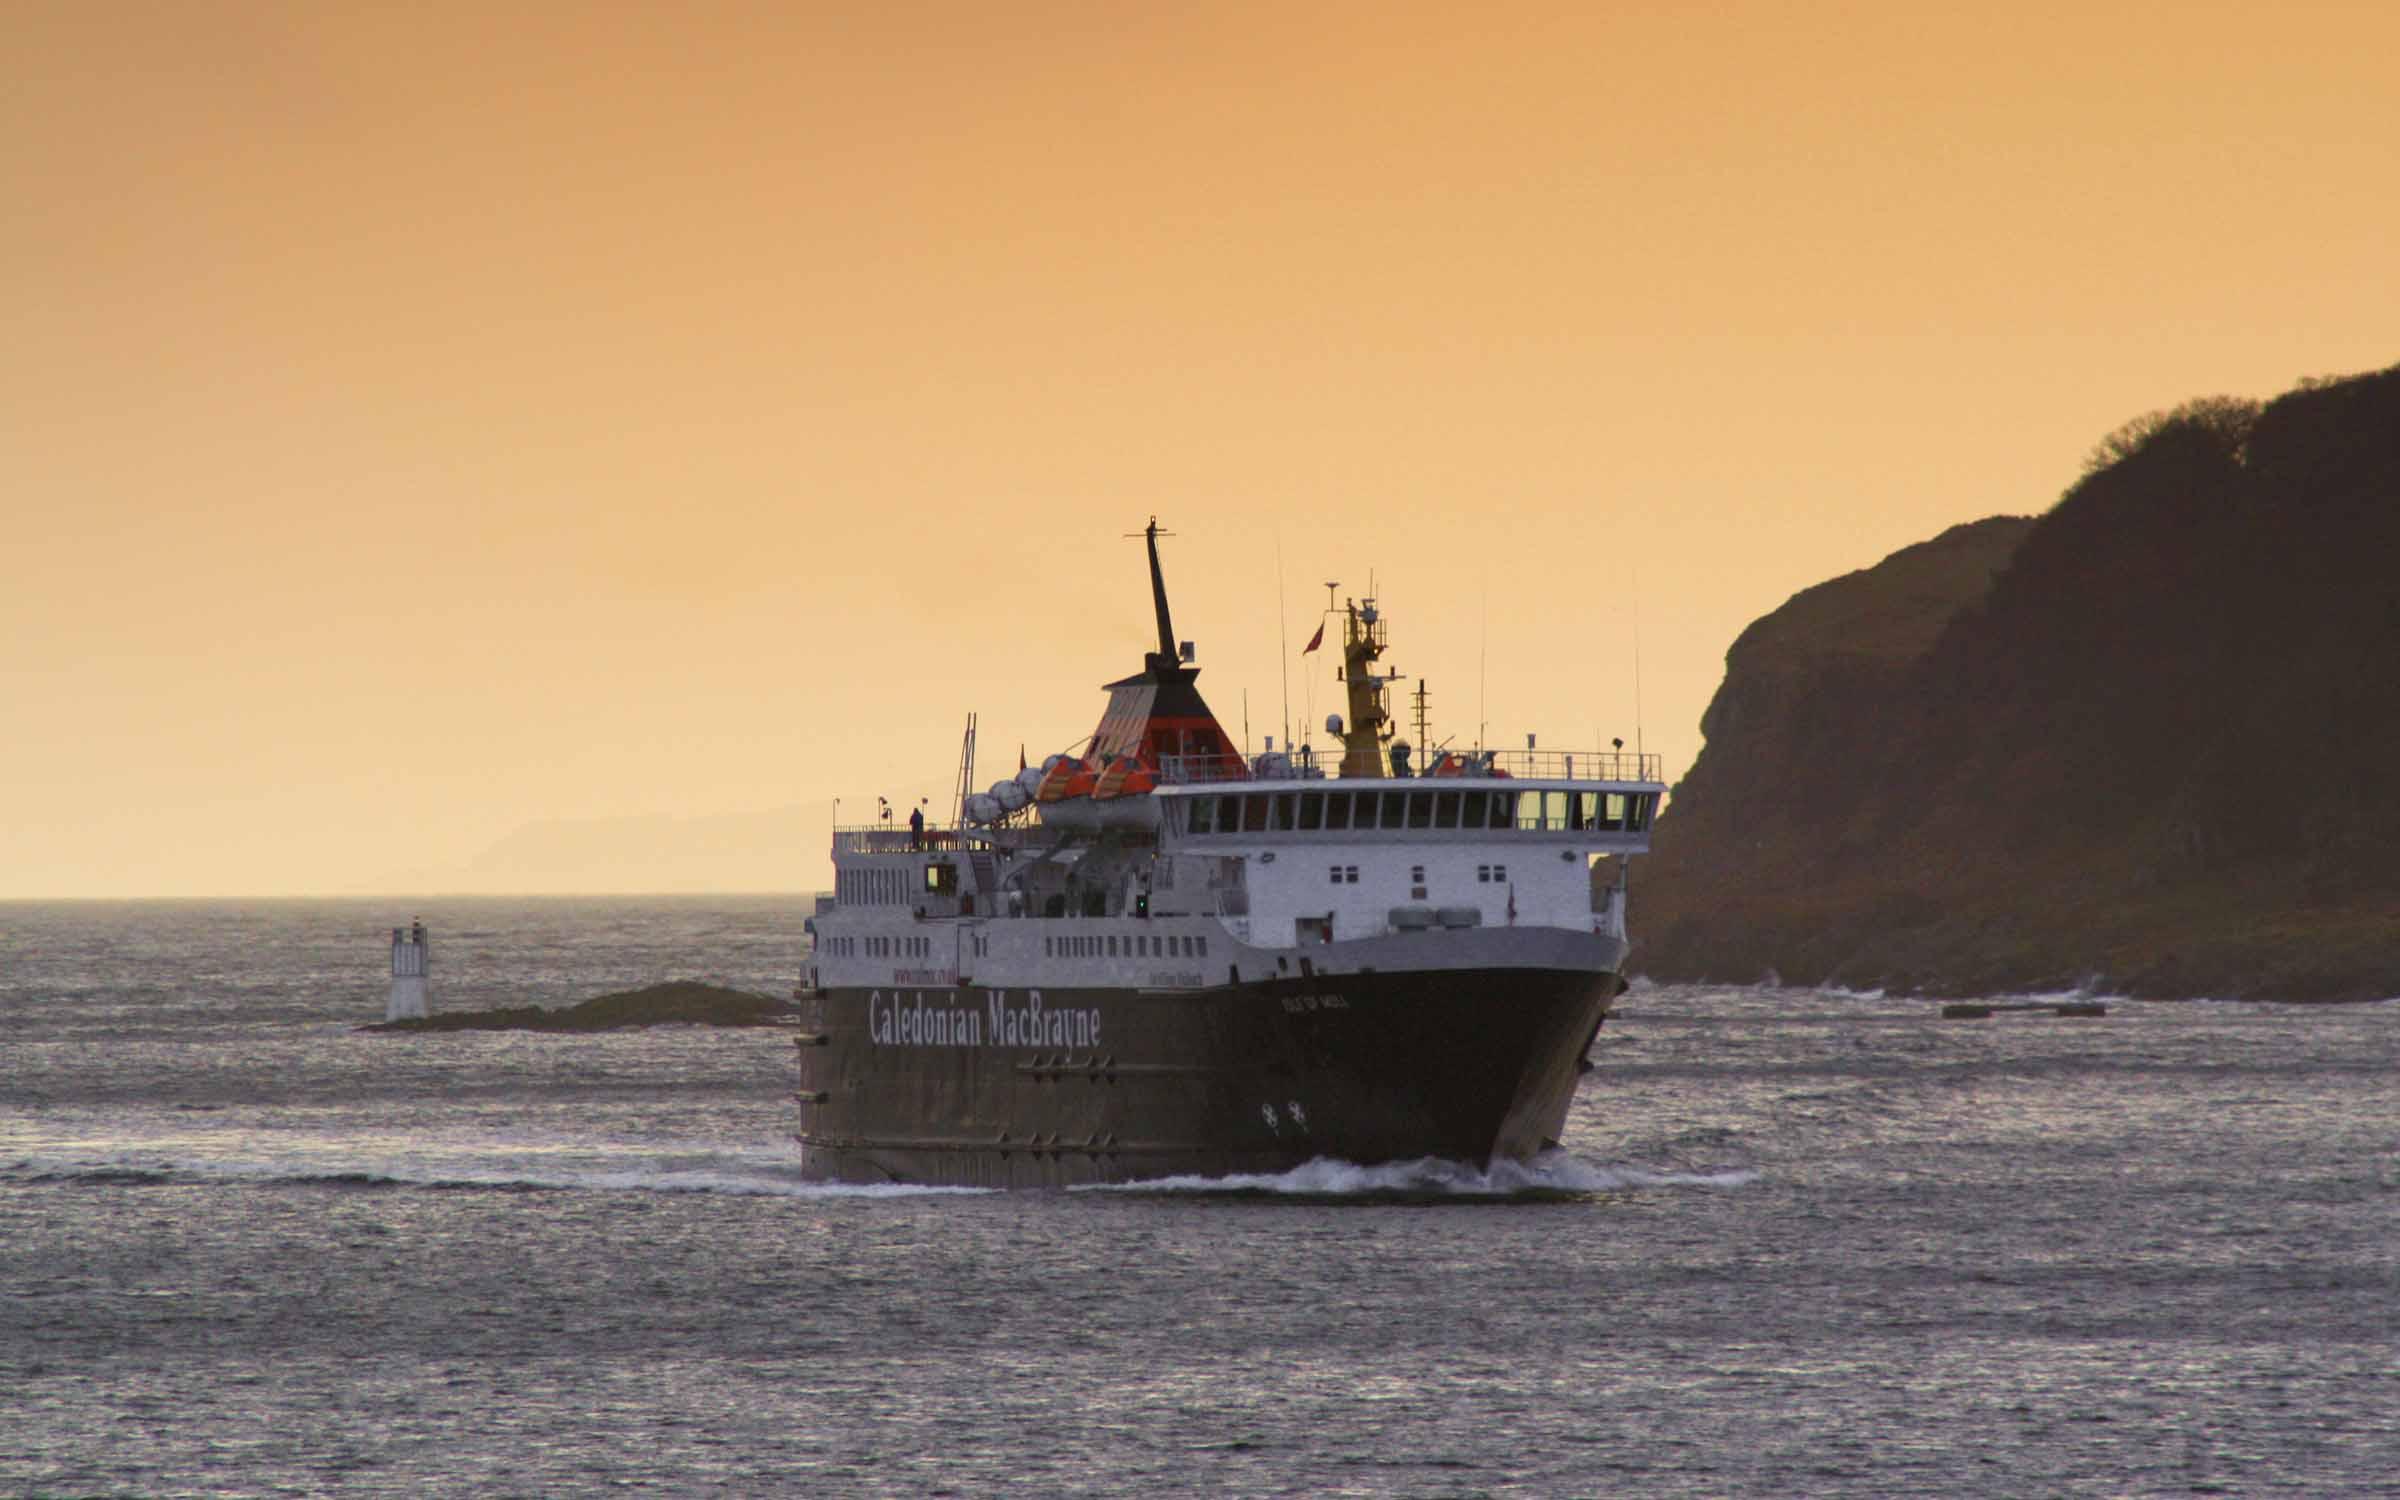 Isle of Mull in the Sound of Kerrera (Ships of CalMac)